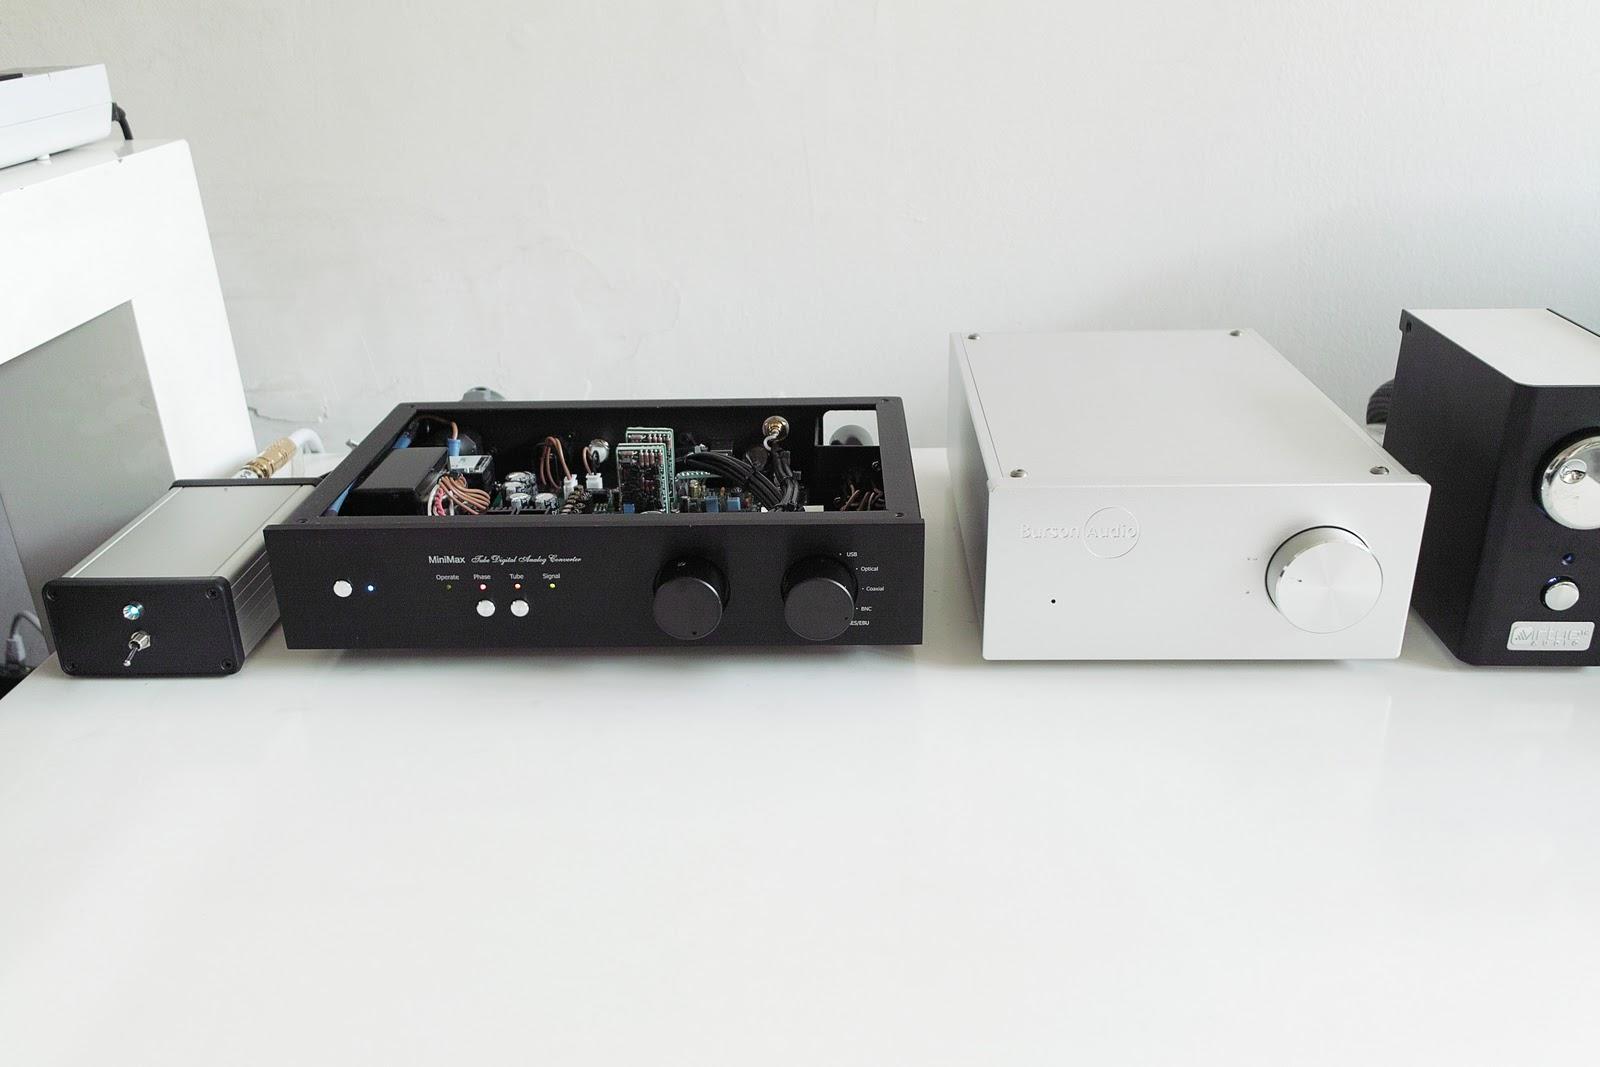 Eastern Electric Minimax Dac discrete opamp